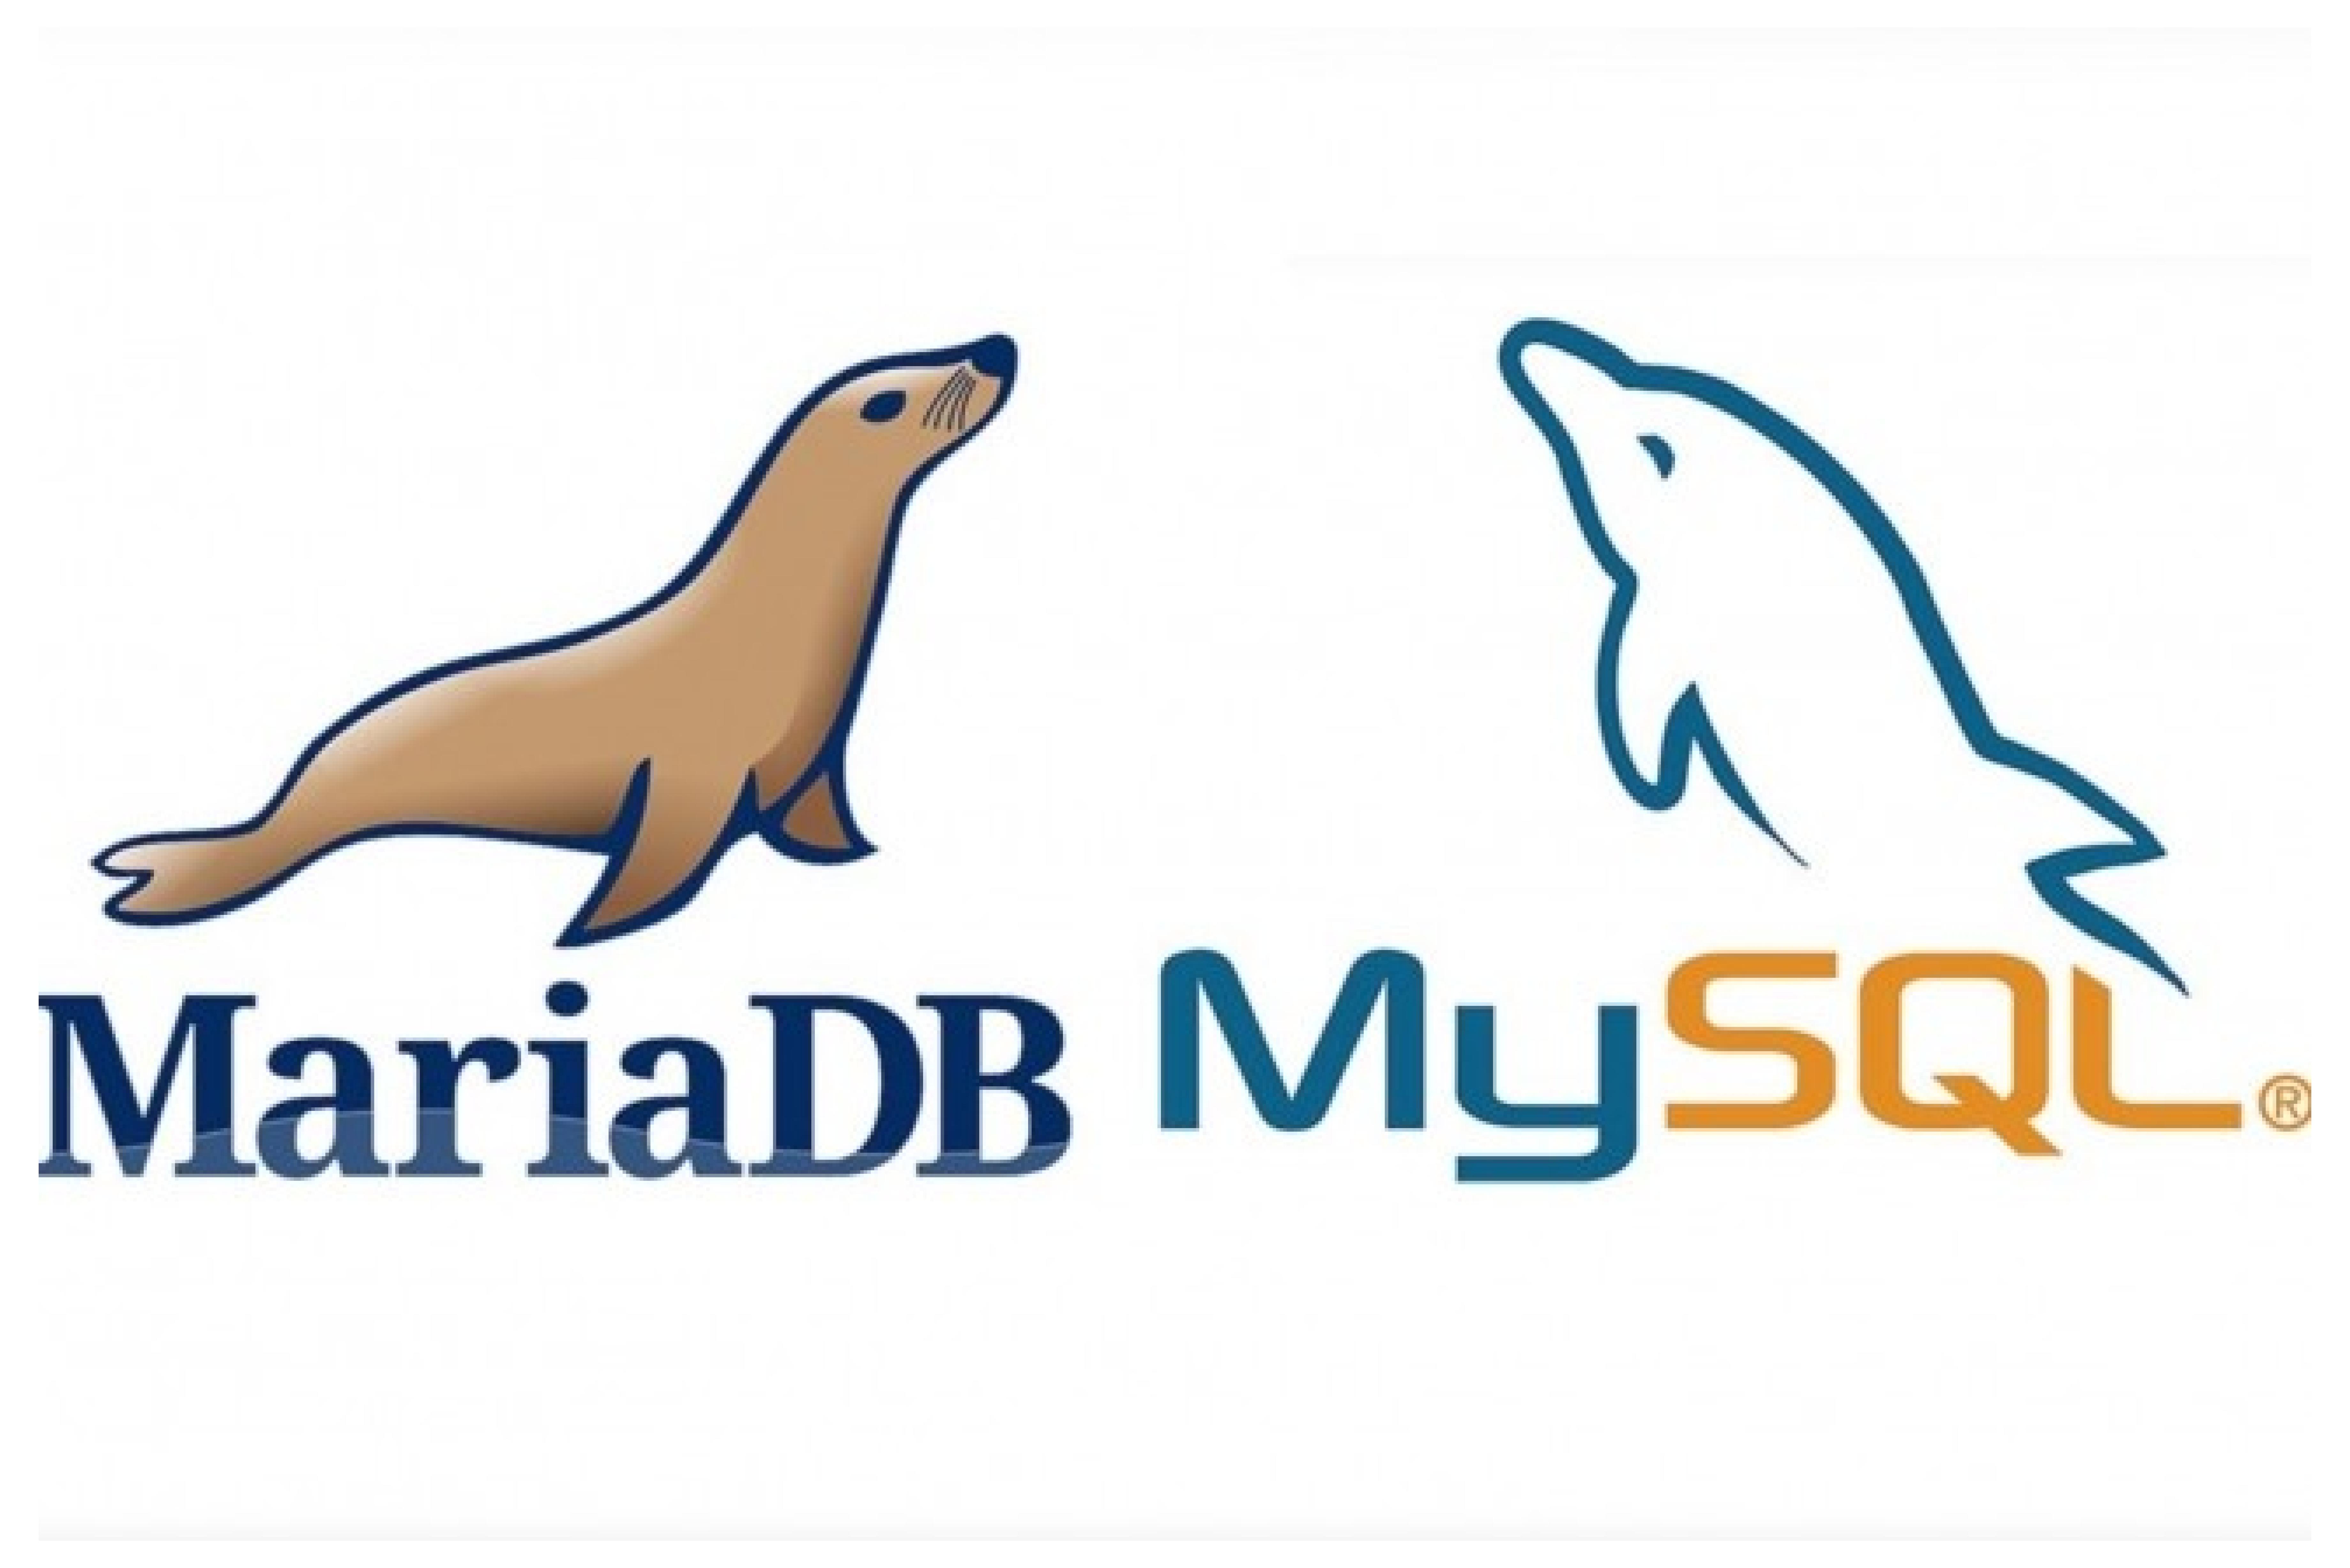 Langage SQL - Pratique de SQL avec MariaDB